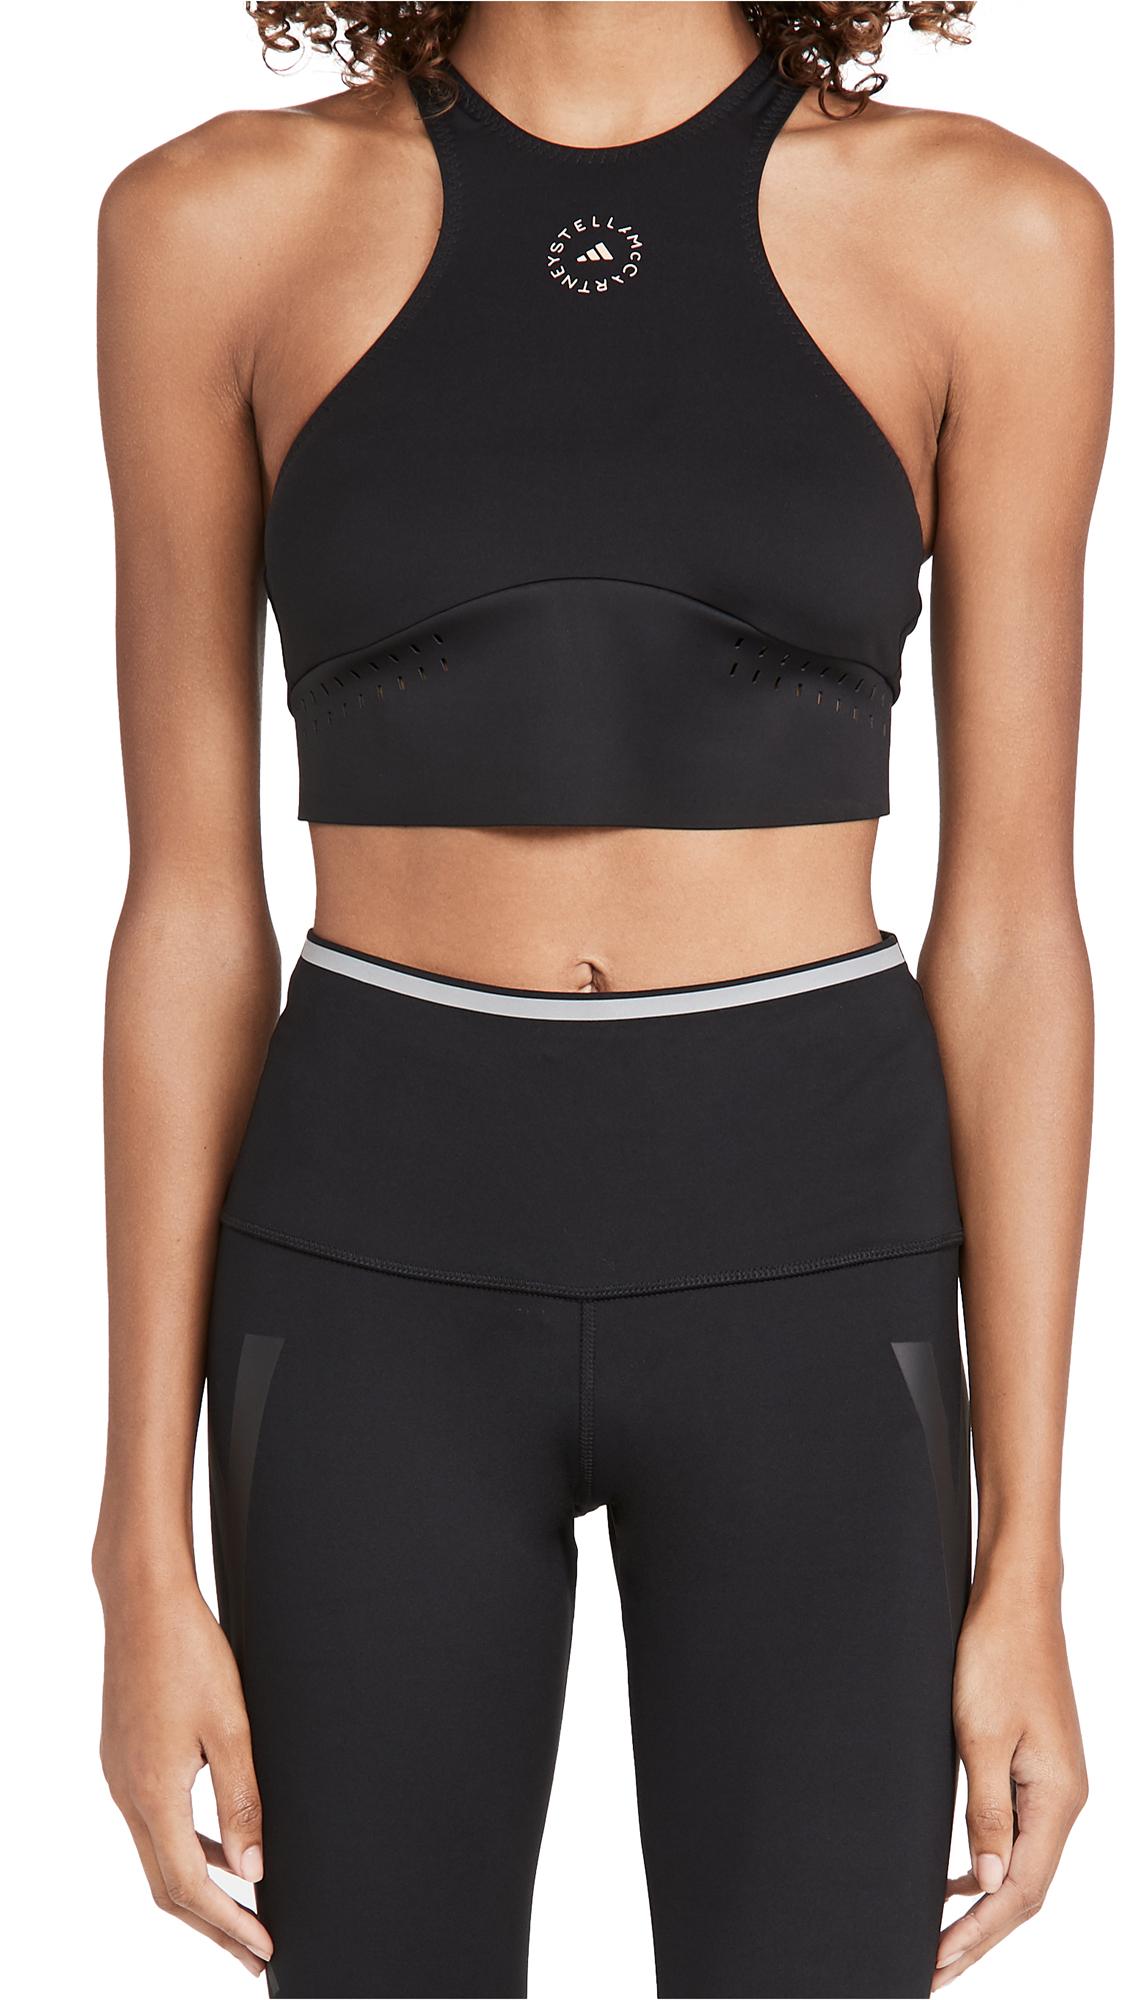 adidas by Stella McCartney Truepur Bikini Top